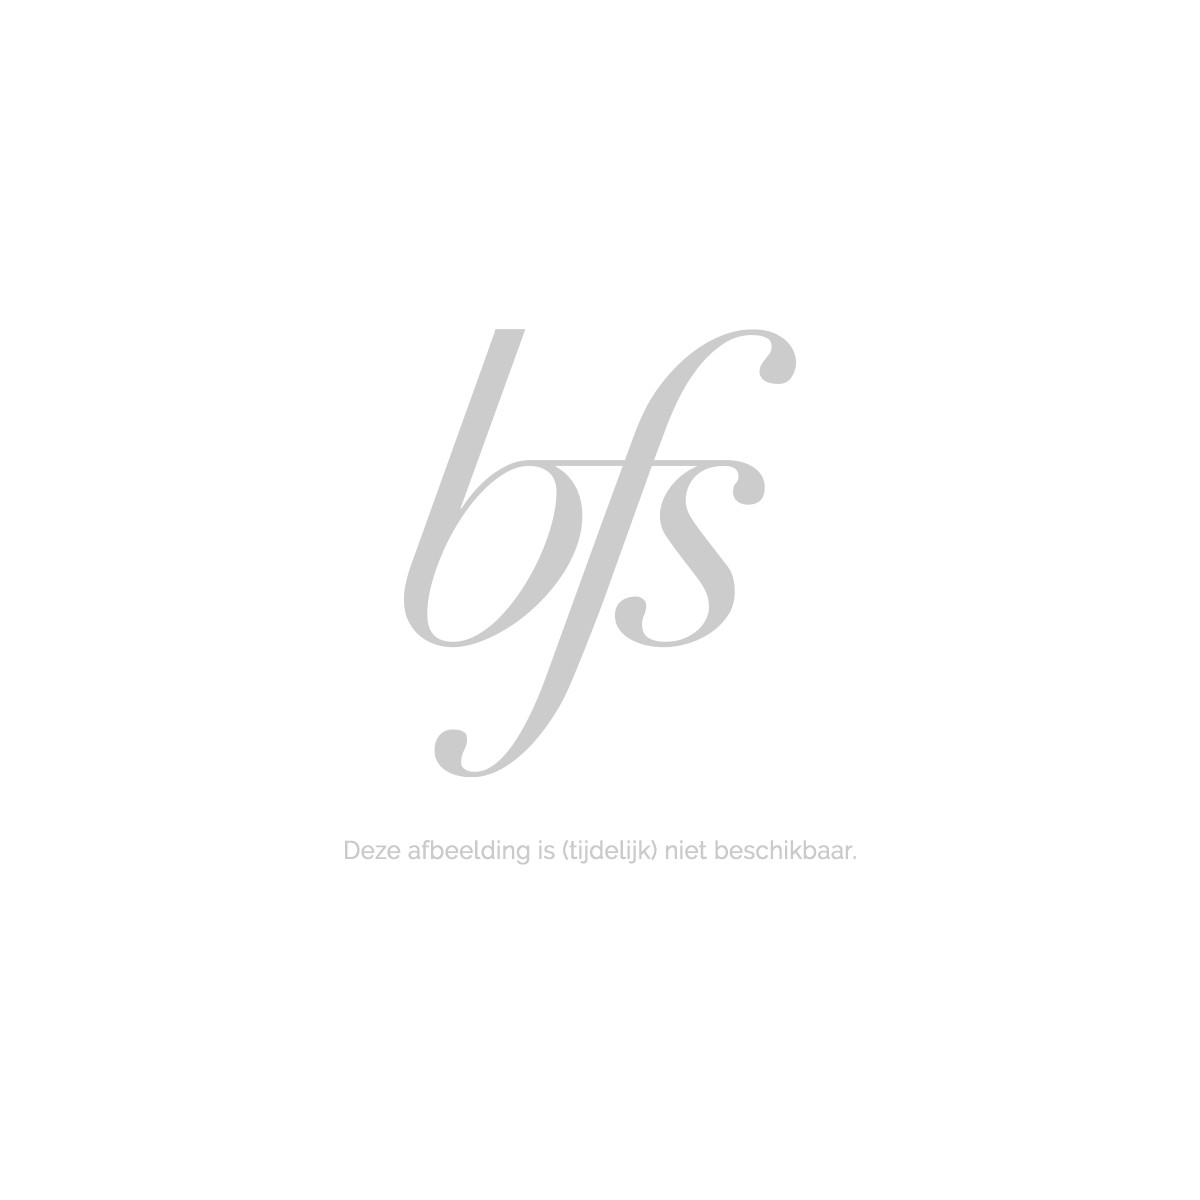 d043381f6f6 Make - Up - Dé online Huidverzorging specialist | Tot 50% Korting.